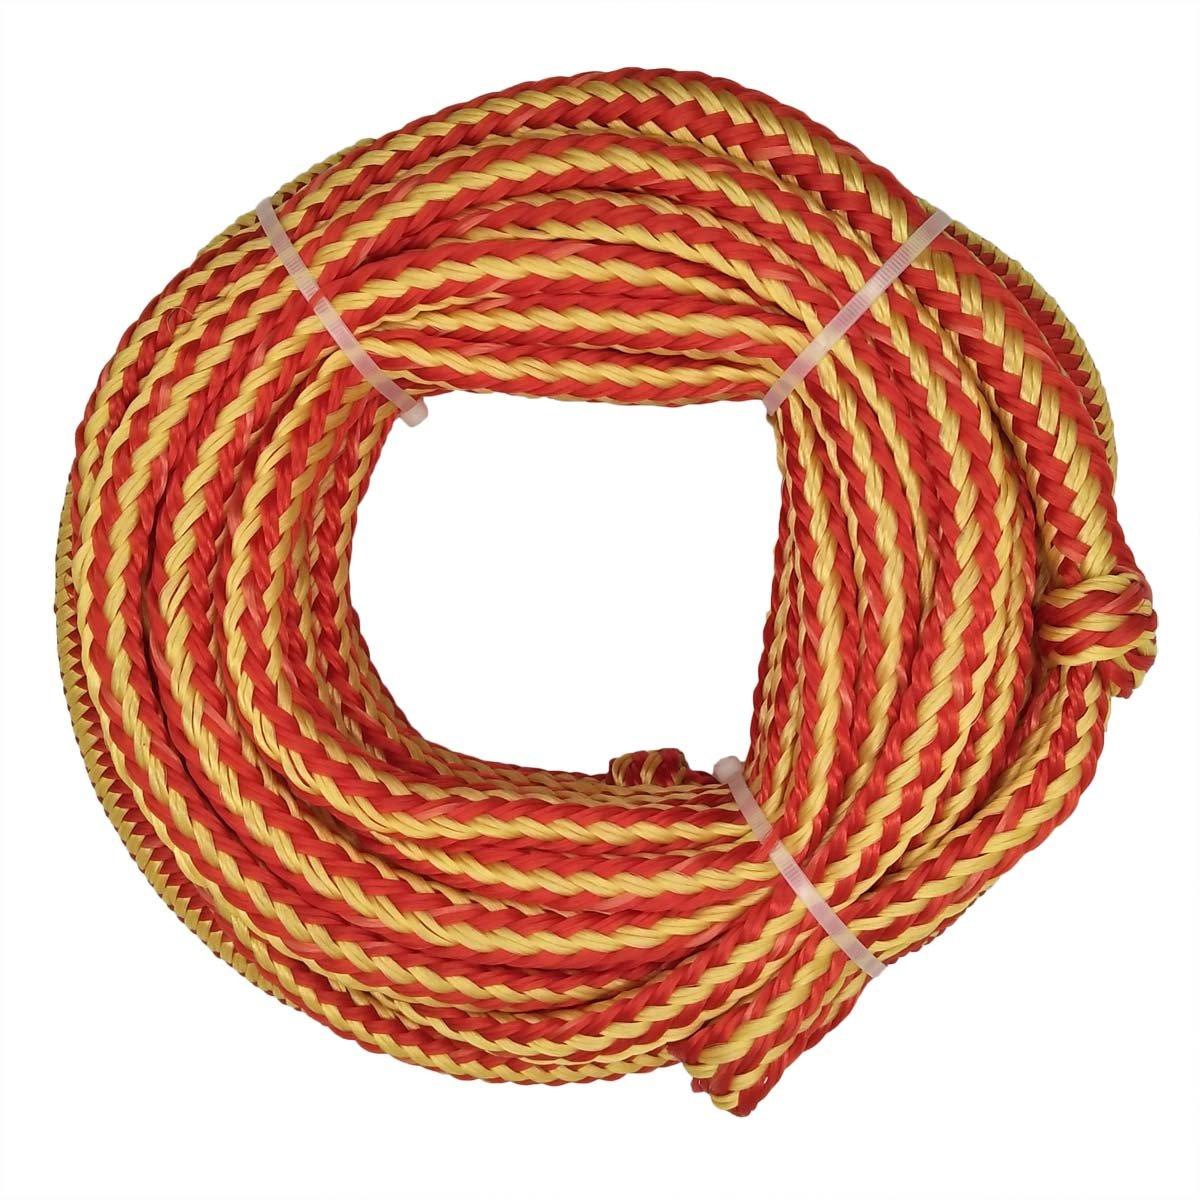 Bungee Tube Tow Rope, 18,3m, arancione 3m Besda